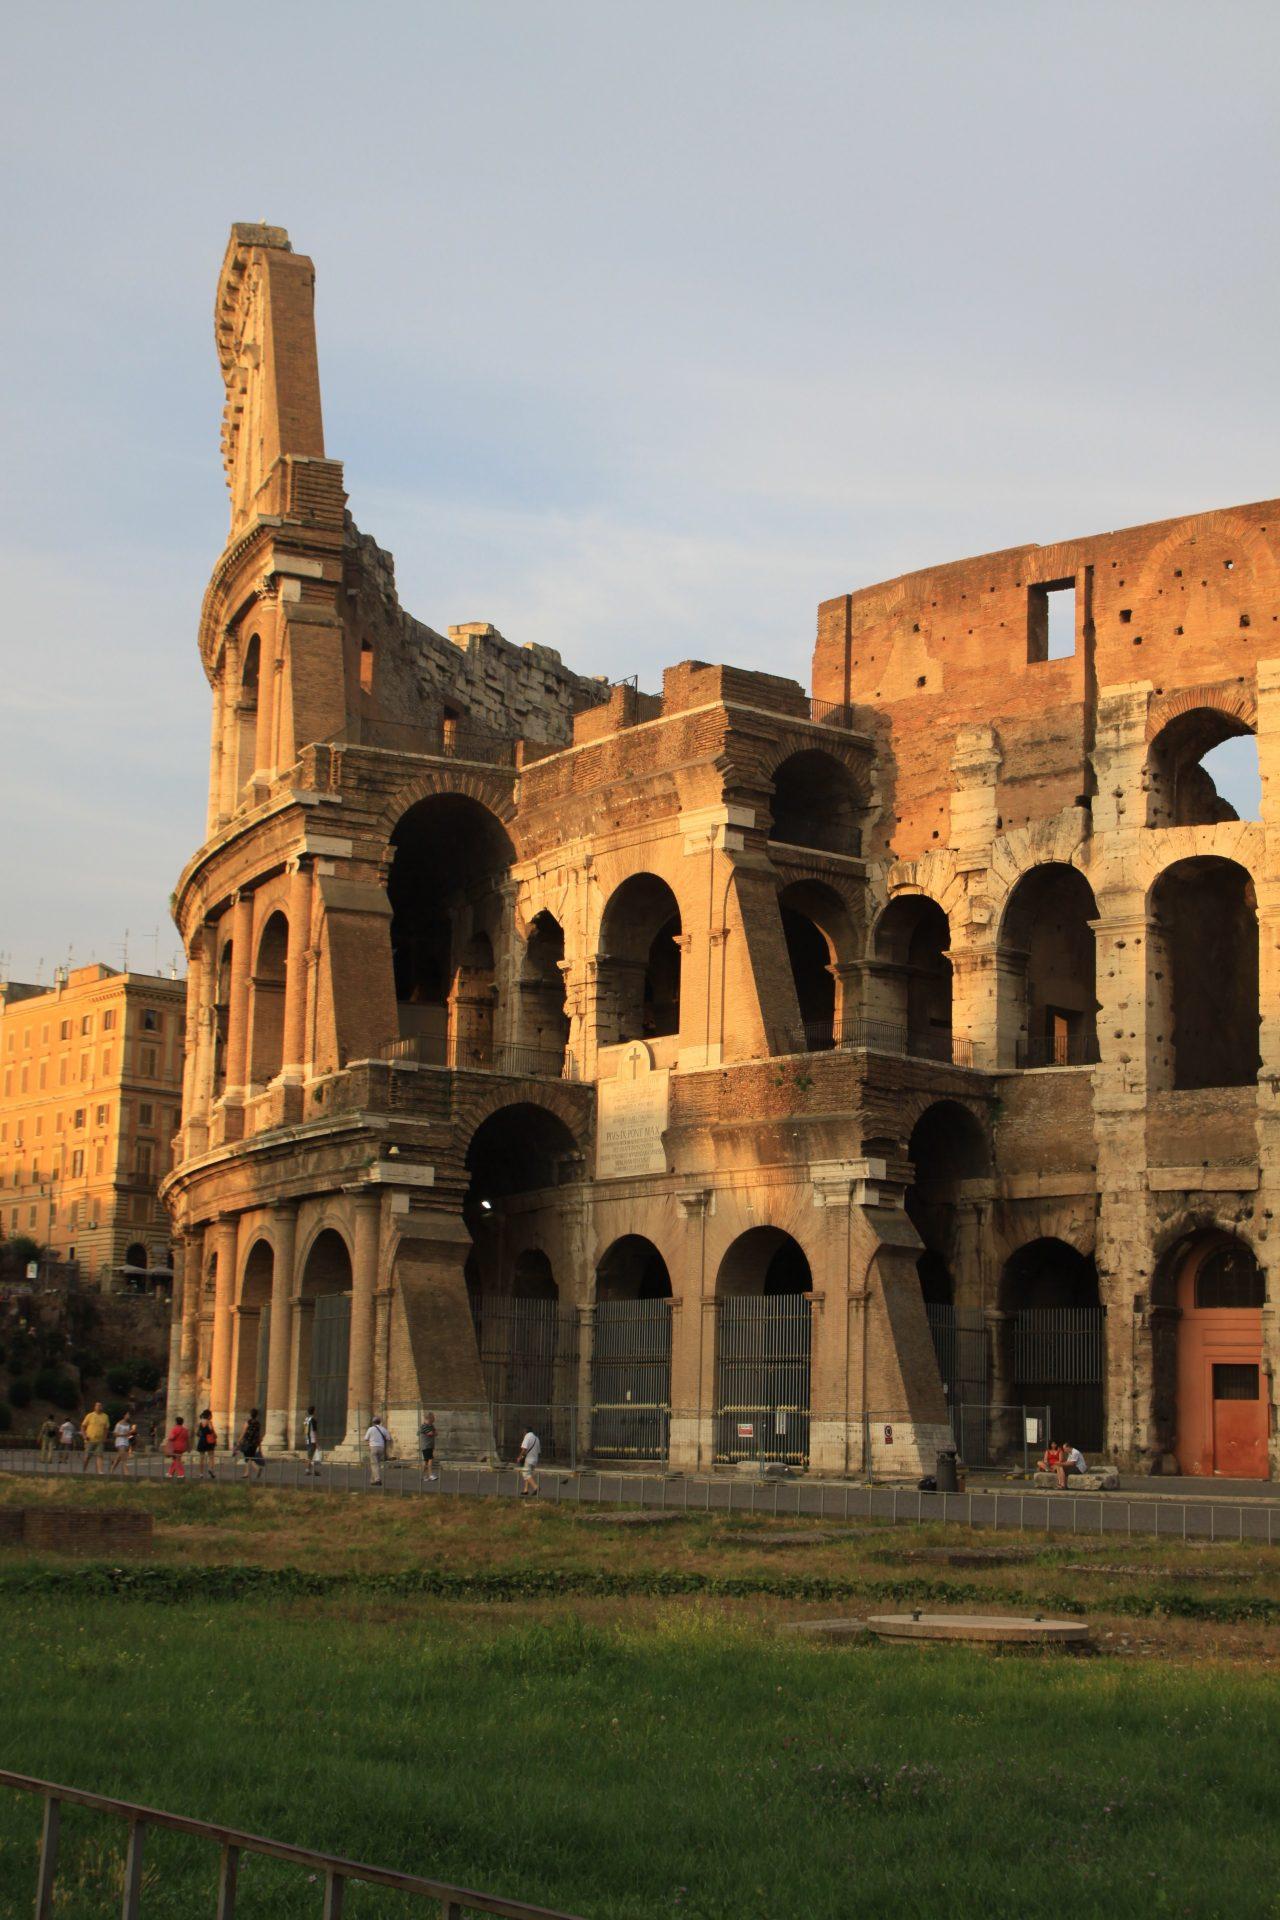 Колизей, Рим, Италия. Июль, 2012